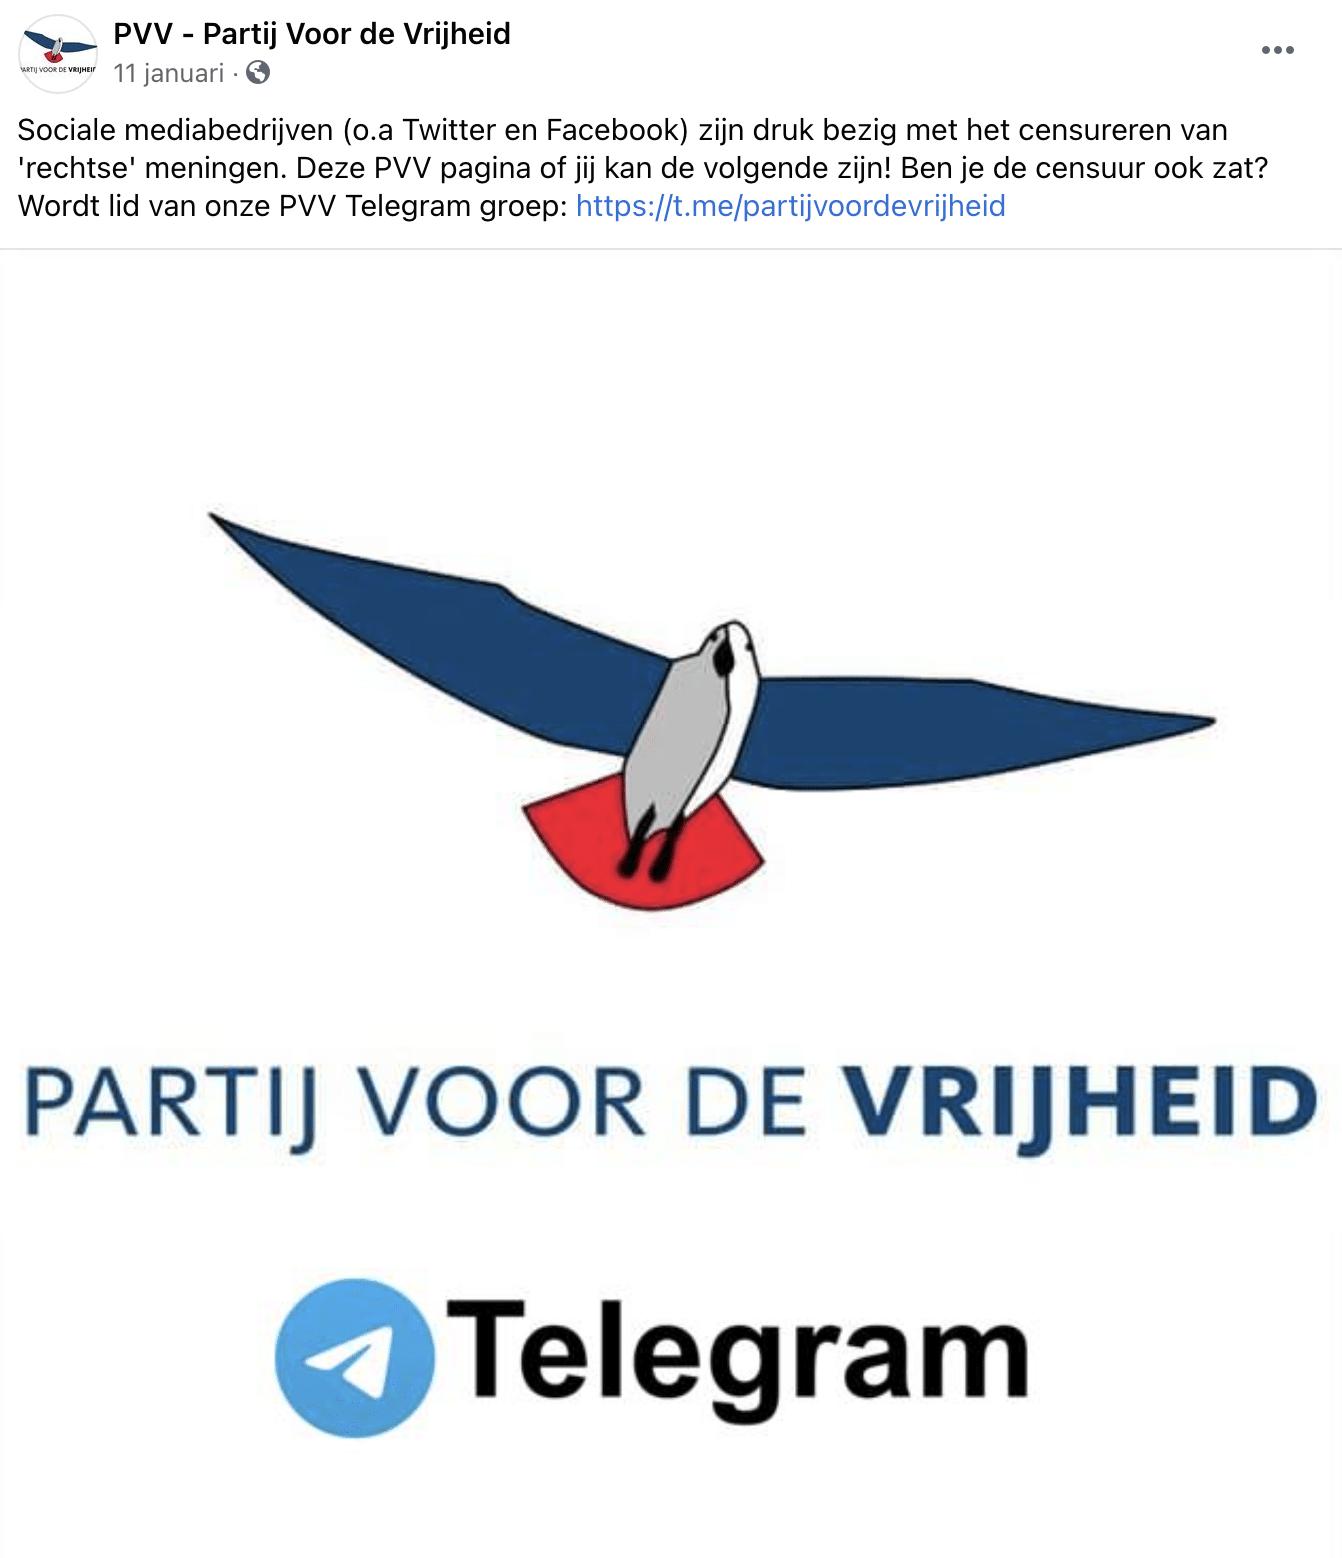 PVV Telegram